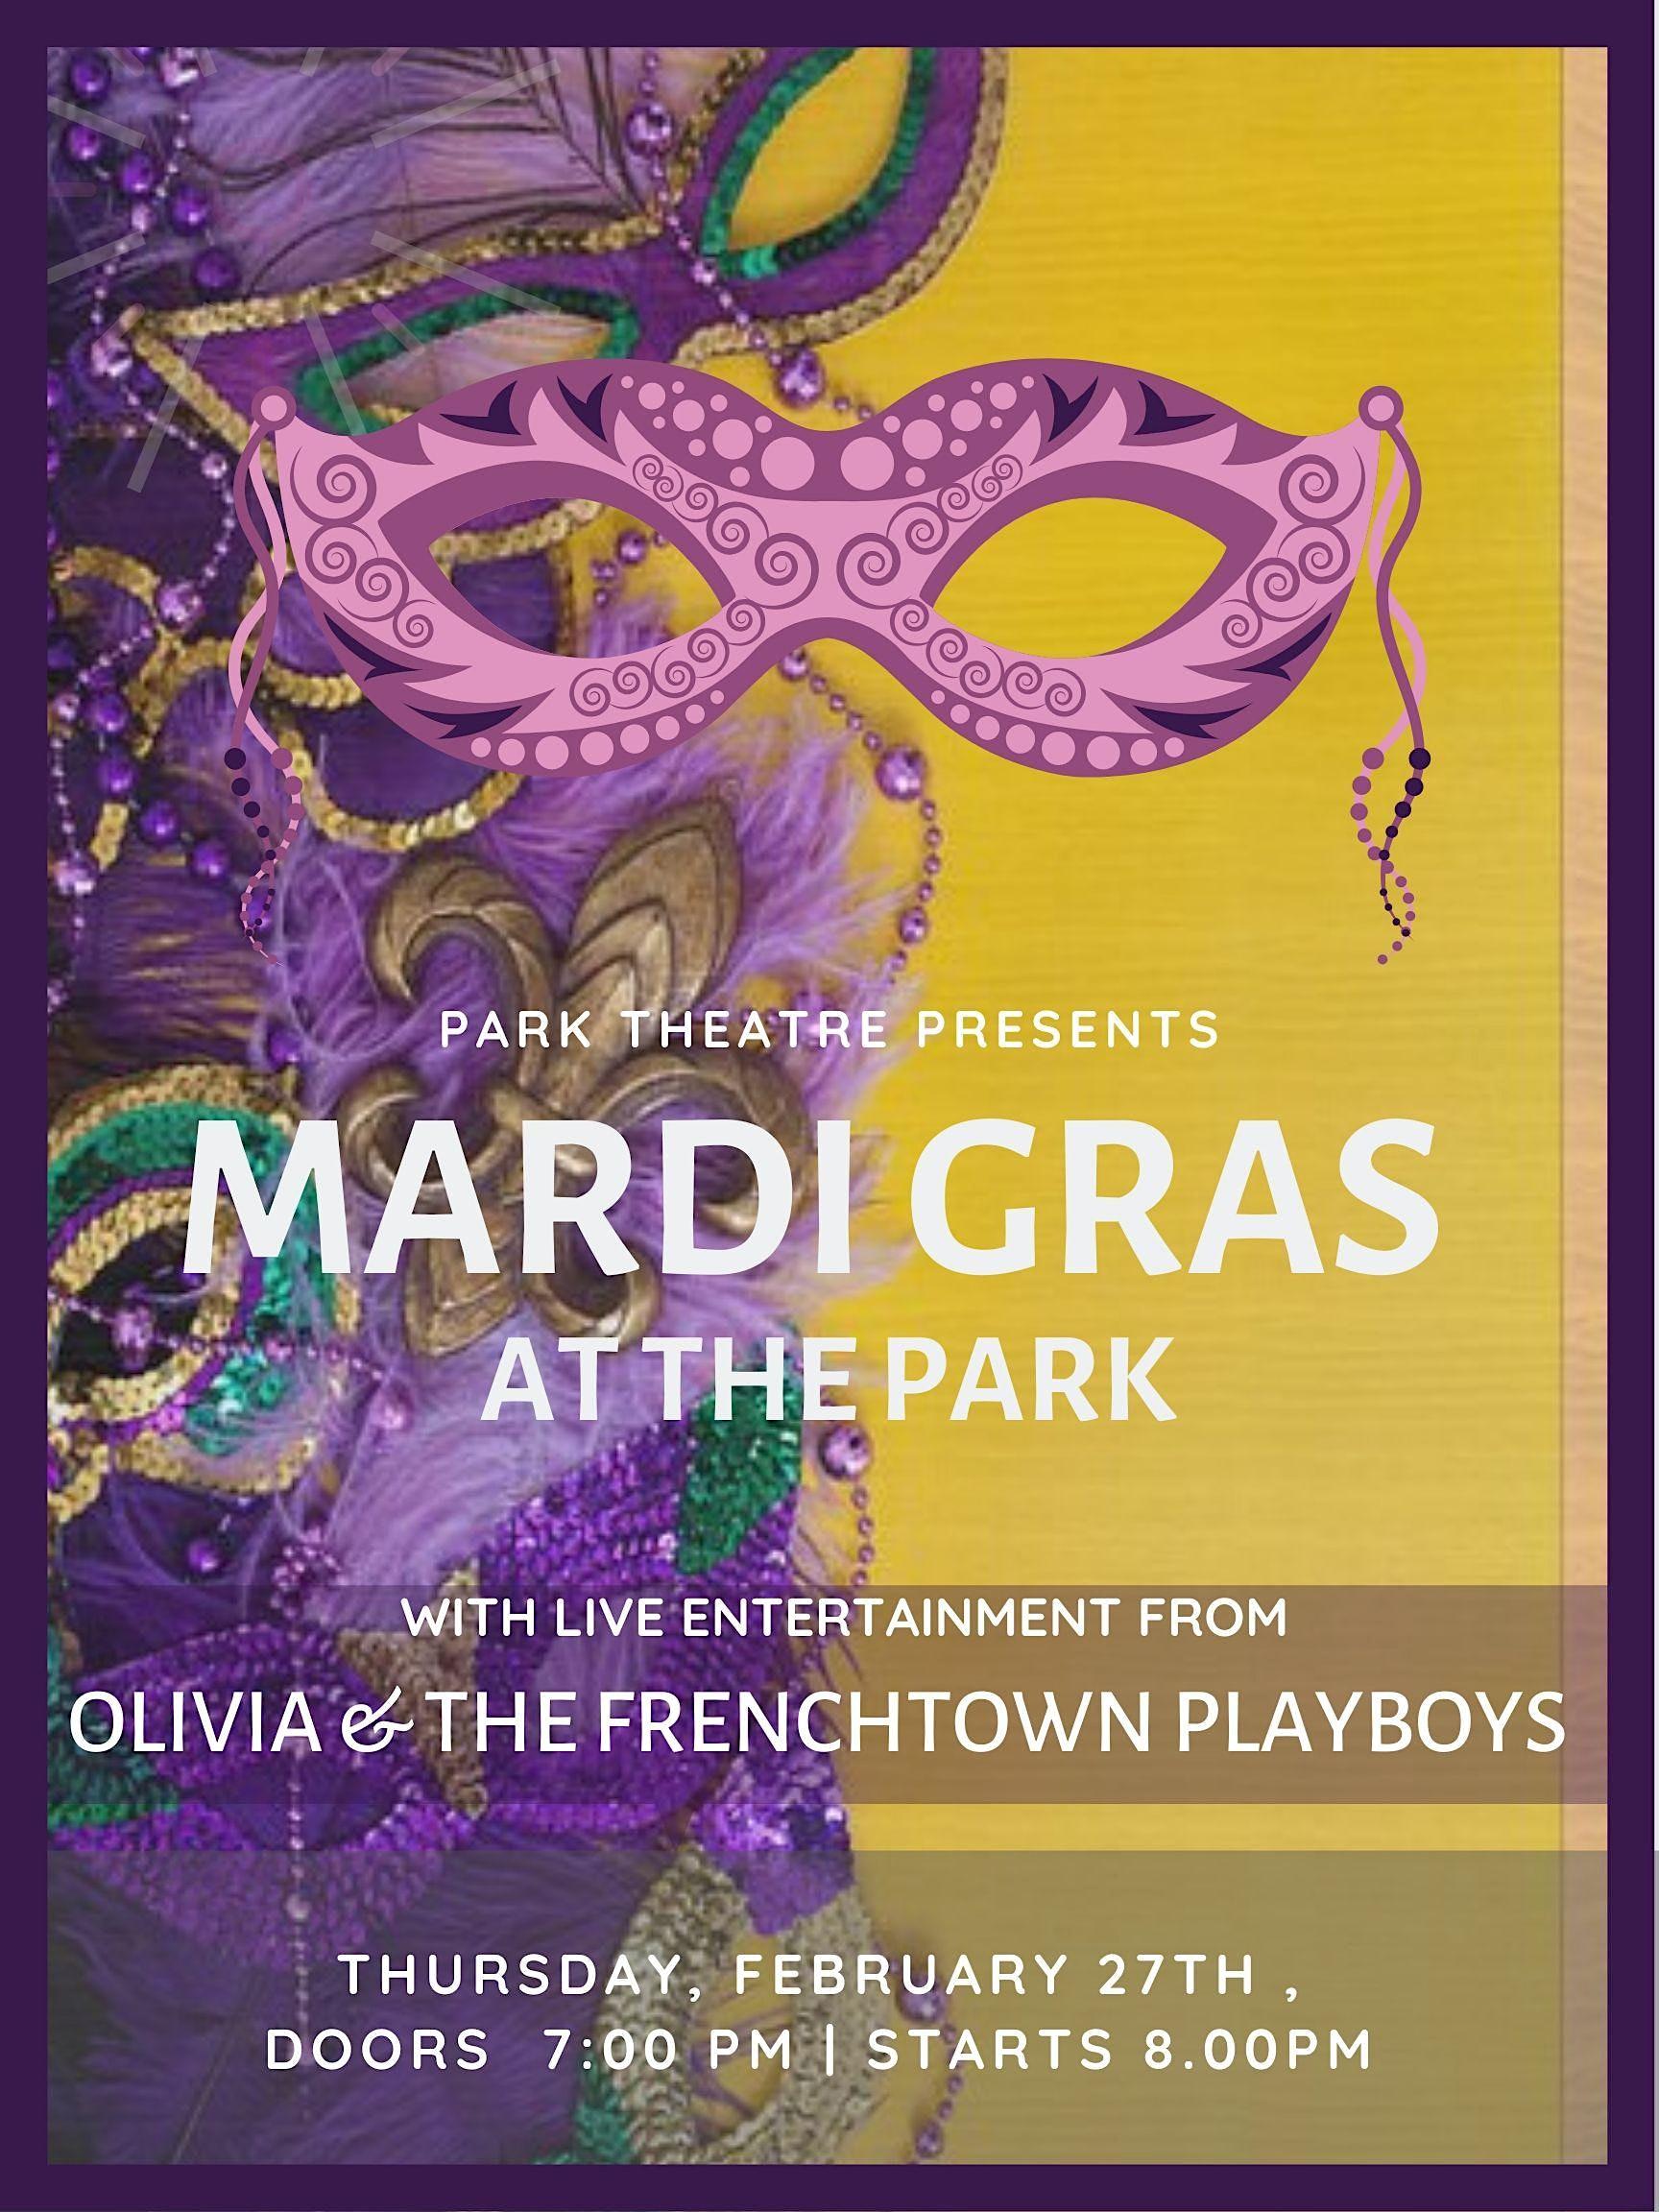 Mardi Gras at the Park!